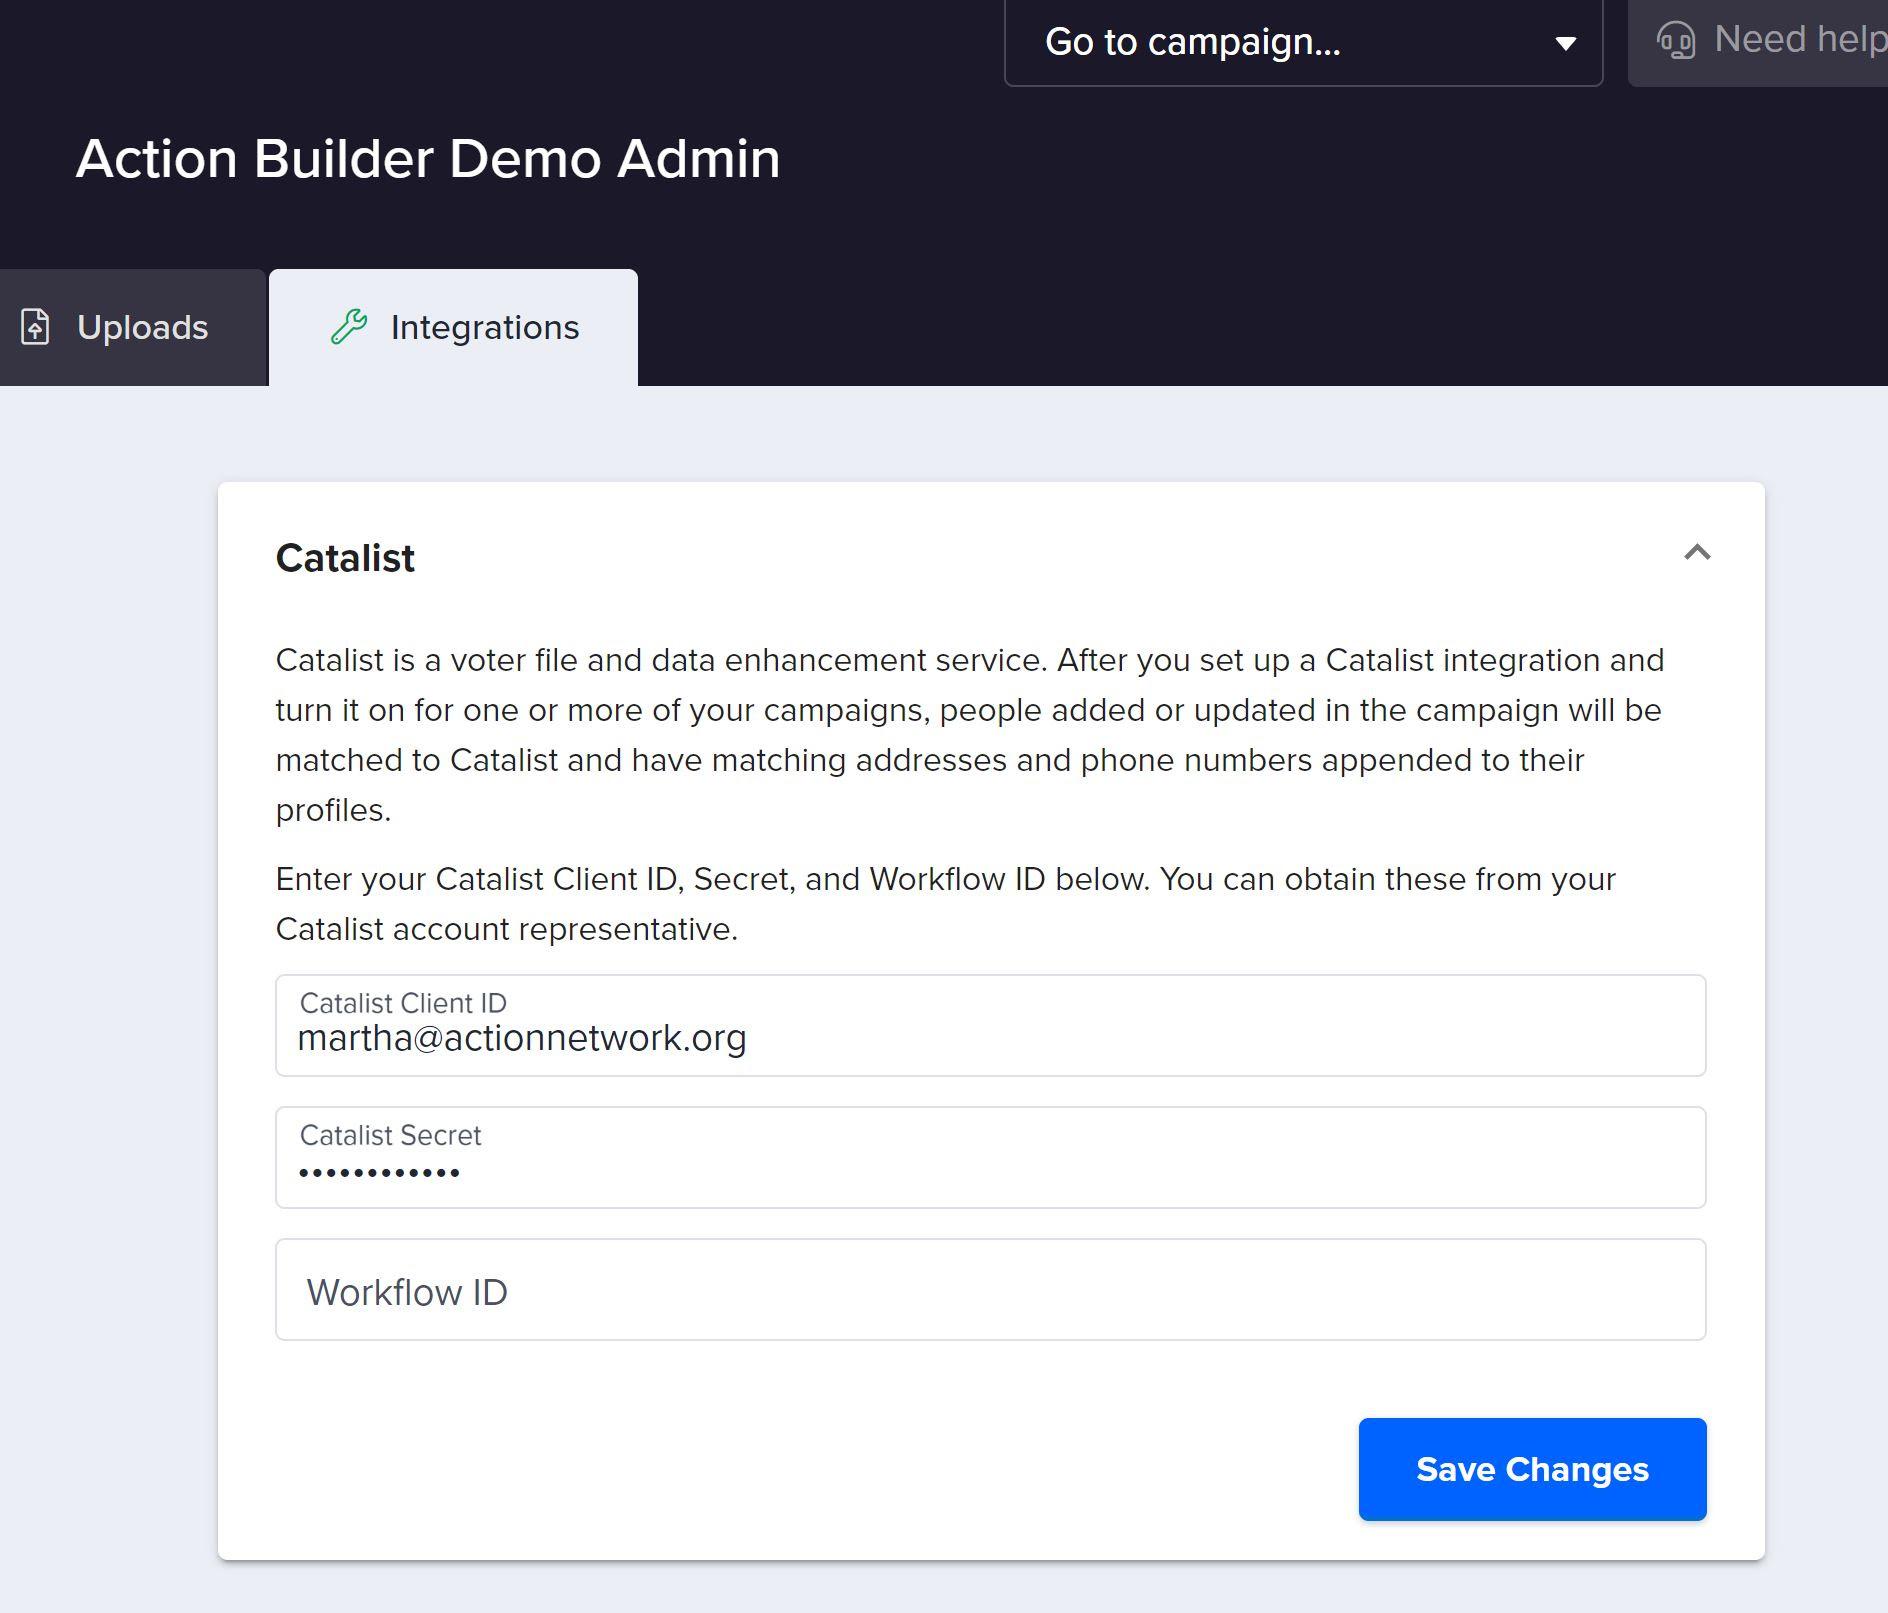 Screenshot of Catalist integration screen in Action Builder.